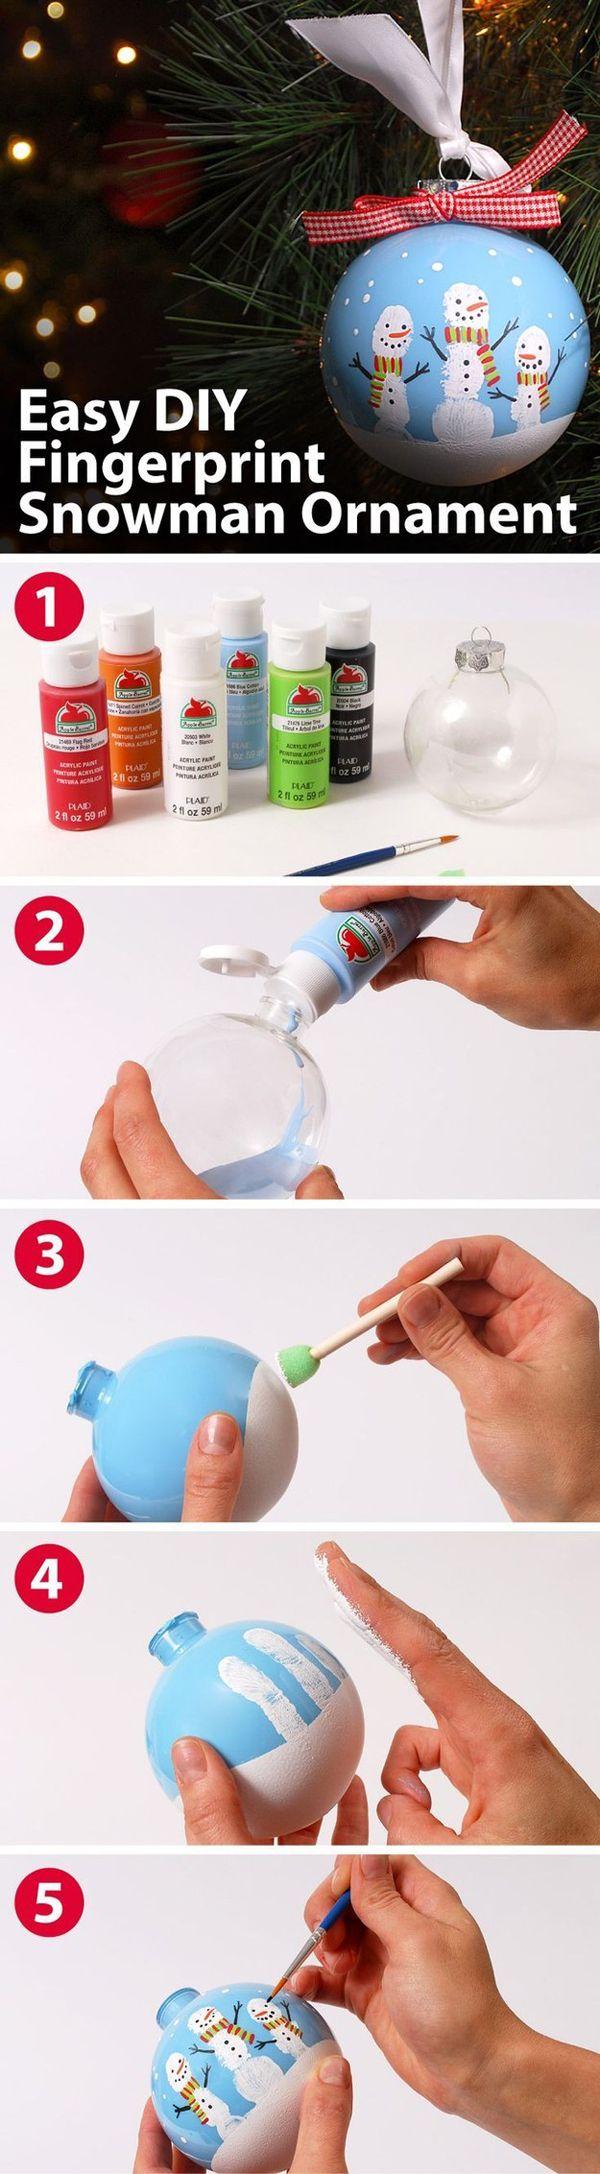 Easy DIY Fingerprint Snowman Ornament! See 25 super creative DIY ornament ideas on www.prettymyparty.com.